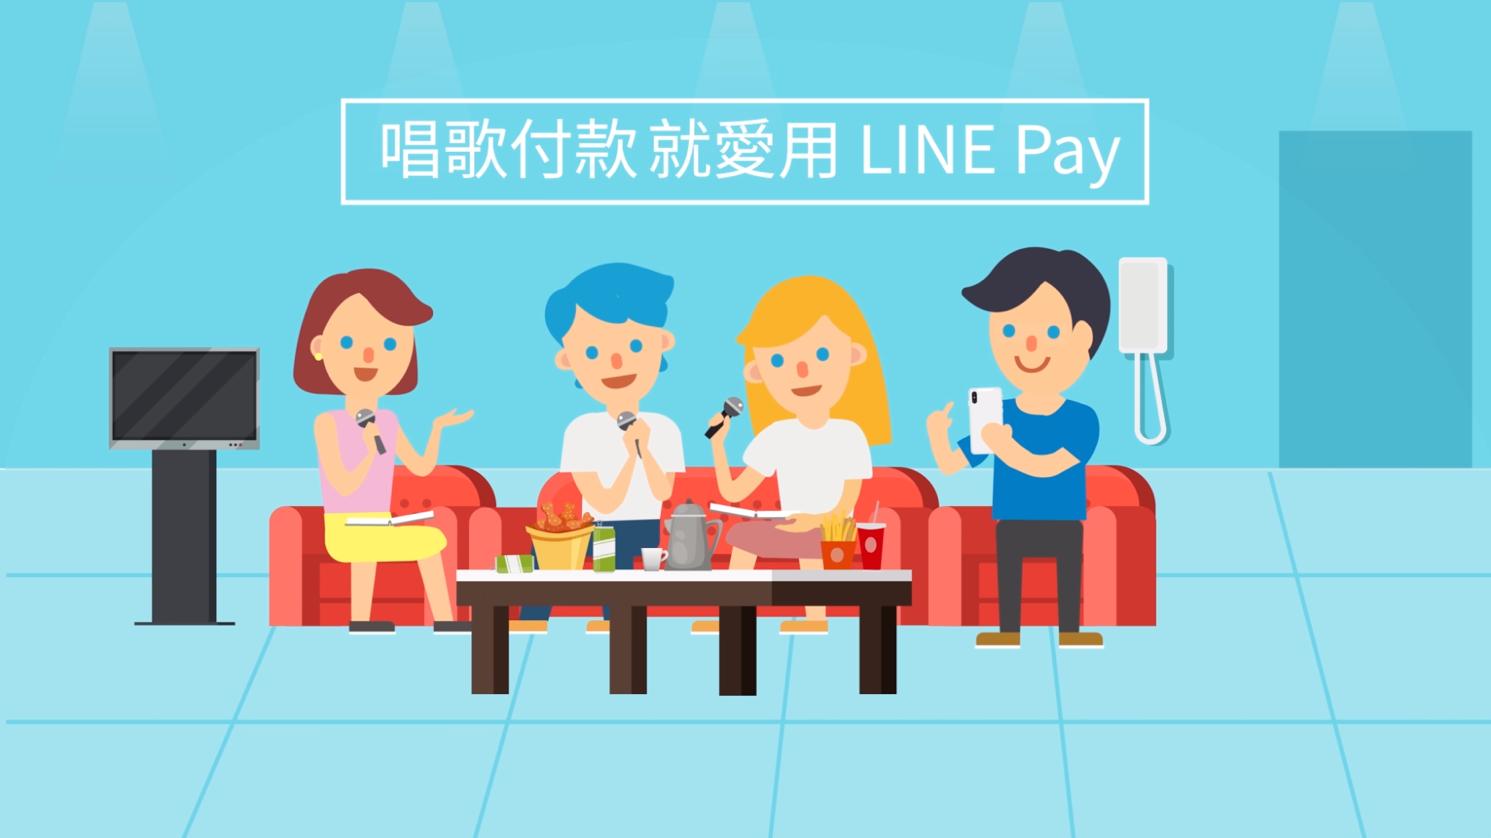 唱 KTV 也能刷 LINE Pay,唱歌、平分帳單更方便 UVRttaeD_LTfYx8Er310BglFx8Sz7mqF5UO3hRTm06v9GSfqRXHbtvQ6LdZ6HCj8dr84g9xXbyh2qZus76hSfAfwULTabrKLDY0oo4vobFeBG1EfPyZUSM4_rs4157eIfs5InUNSkv8dlKJmYg